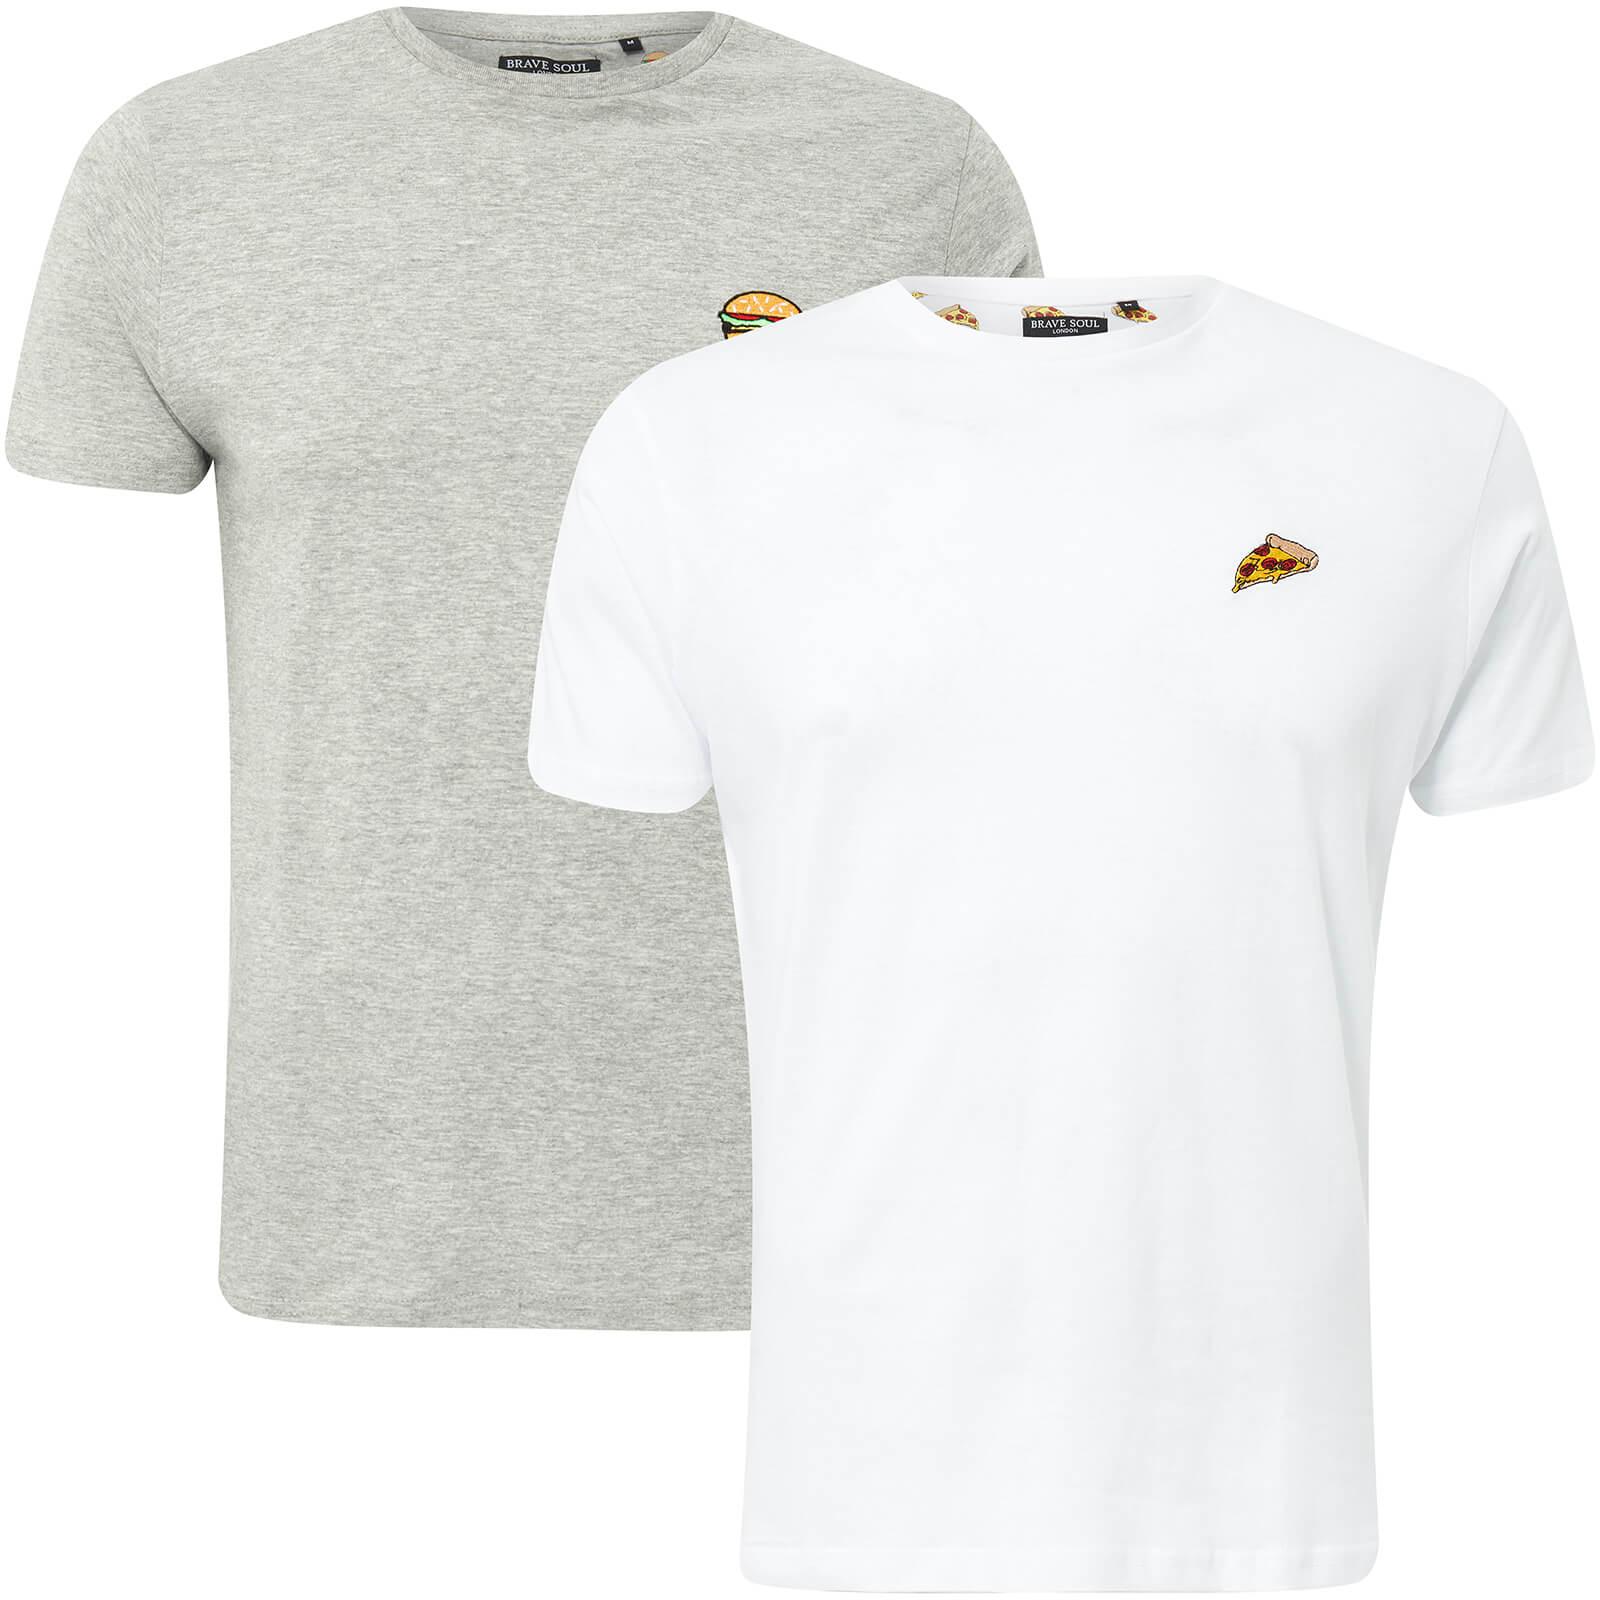 8e4218c7e Brave Soul Men's Dorado Burger & Pizza 2-Pack T-Shirt - Light Grey Marl/ White Clothing | Zavvi